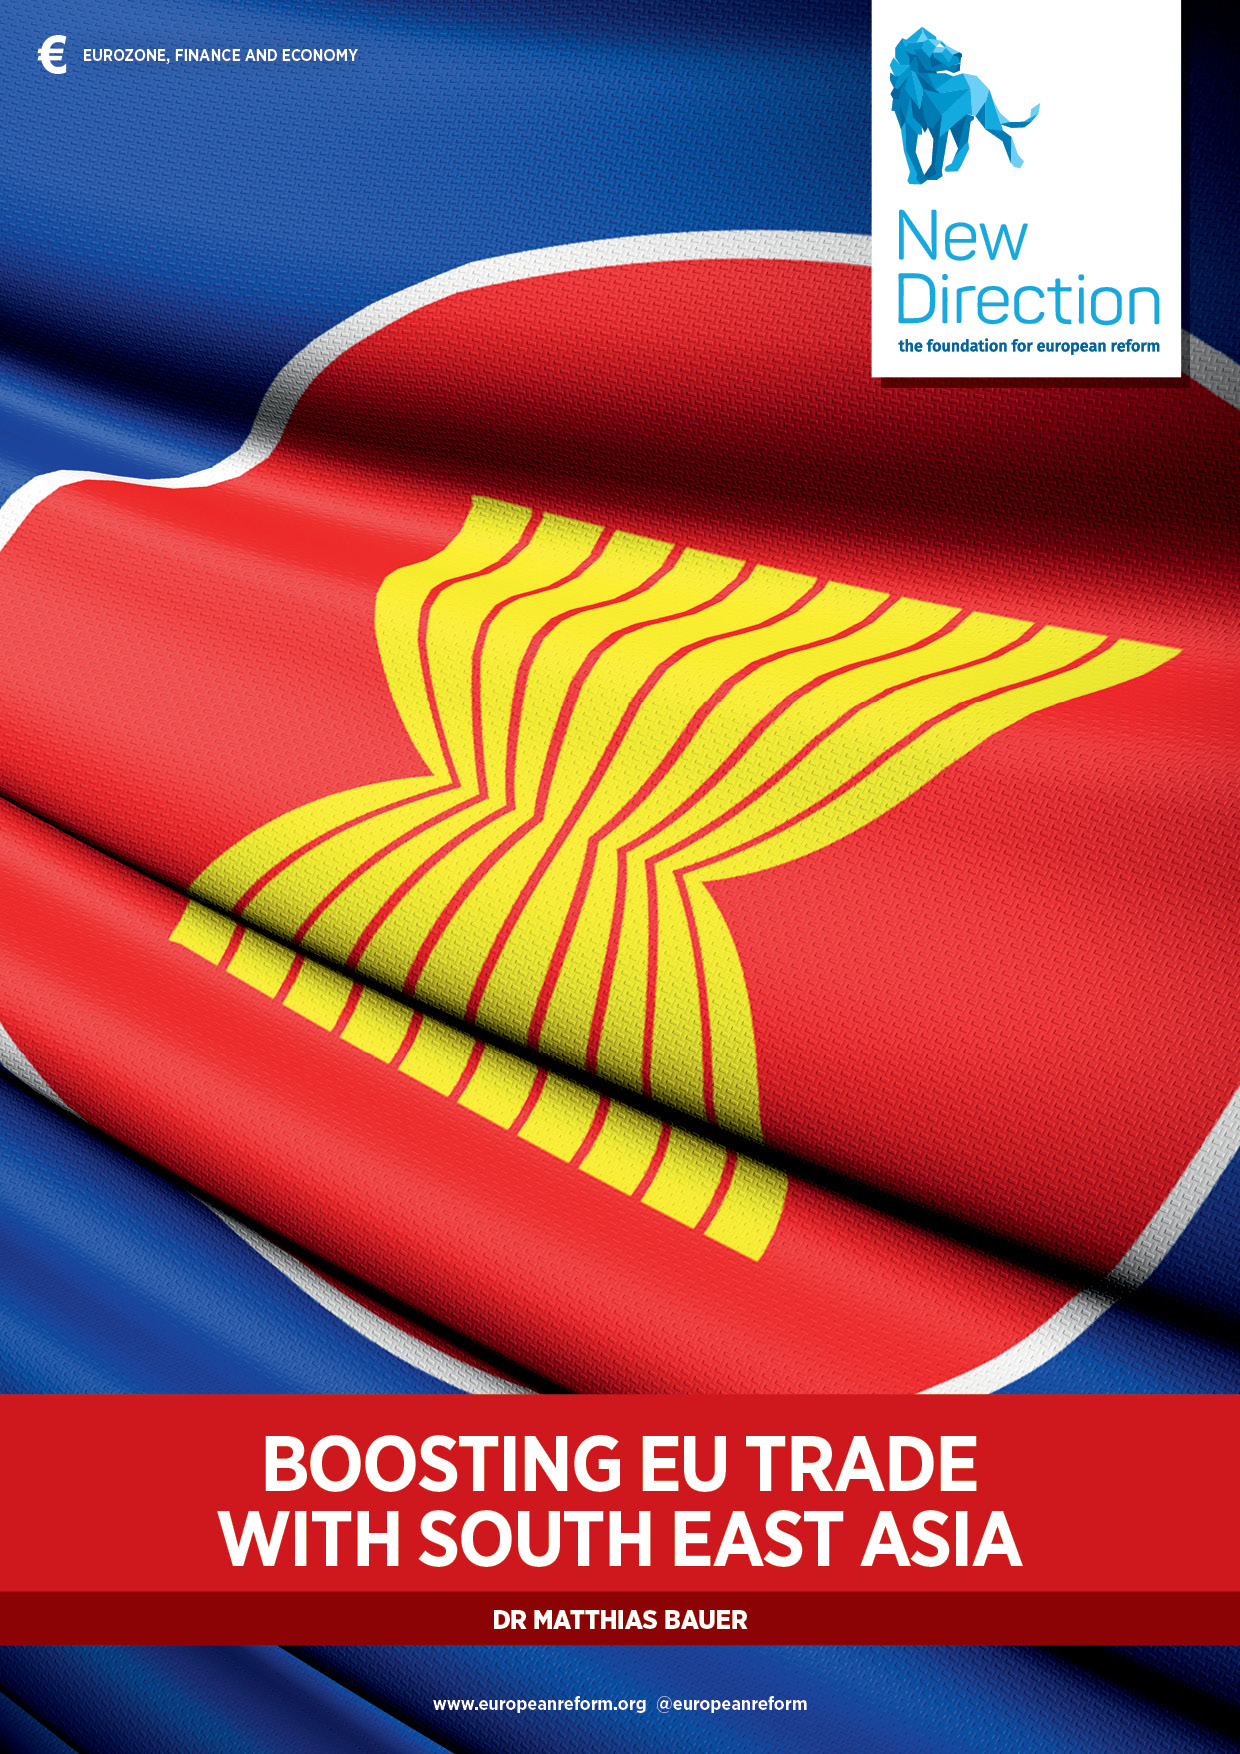 Boosting EU Trade with South East Asia